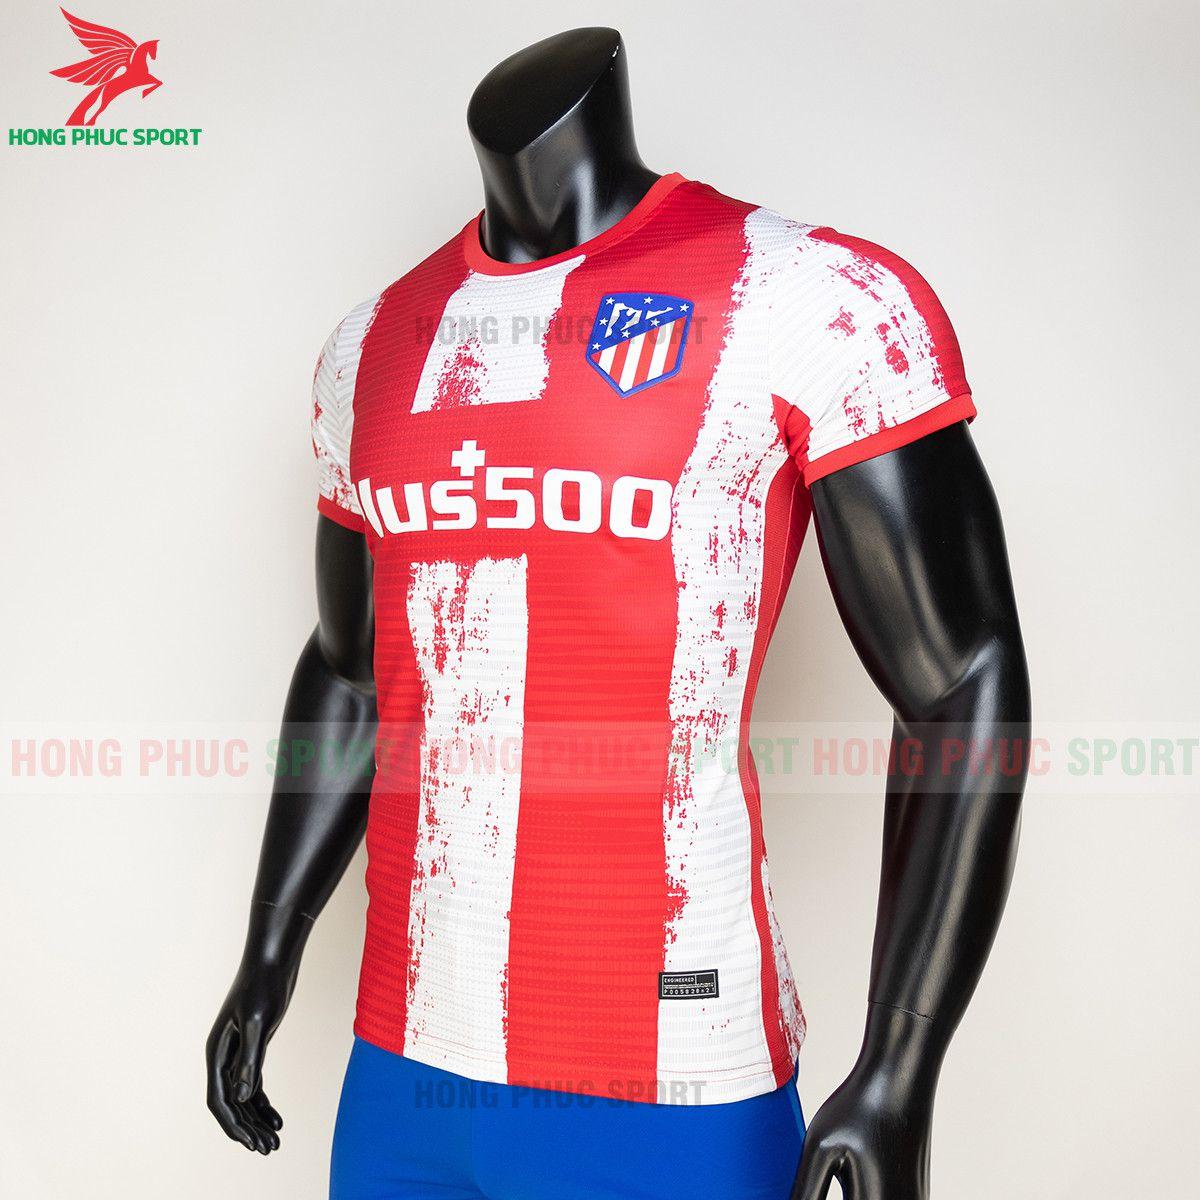 https://cdn.hongphucsport.com/unsafe/s4.shopbay.vn/files/285/ao-bong-da-atletico-madrid-2021-22-san-nha-thailand-3-61558e999bbe7.jpg